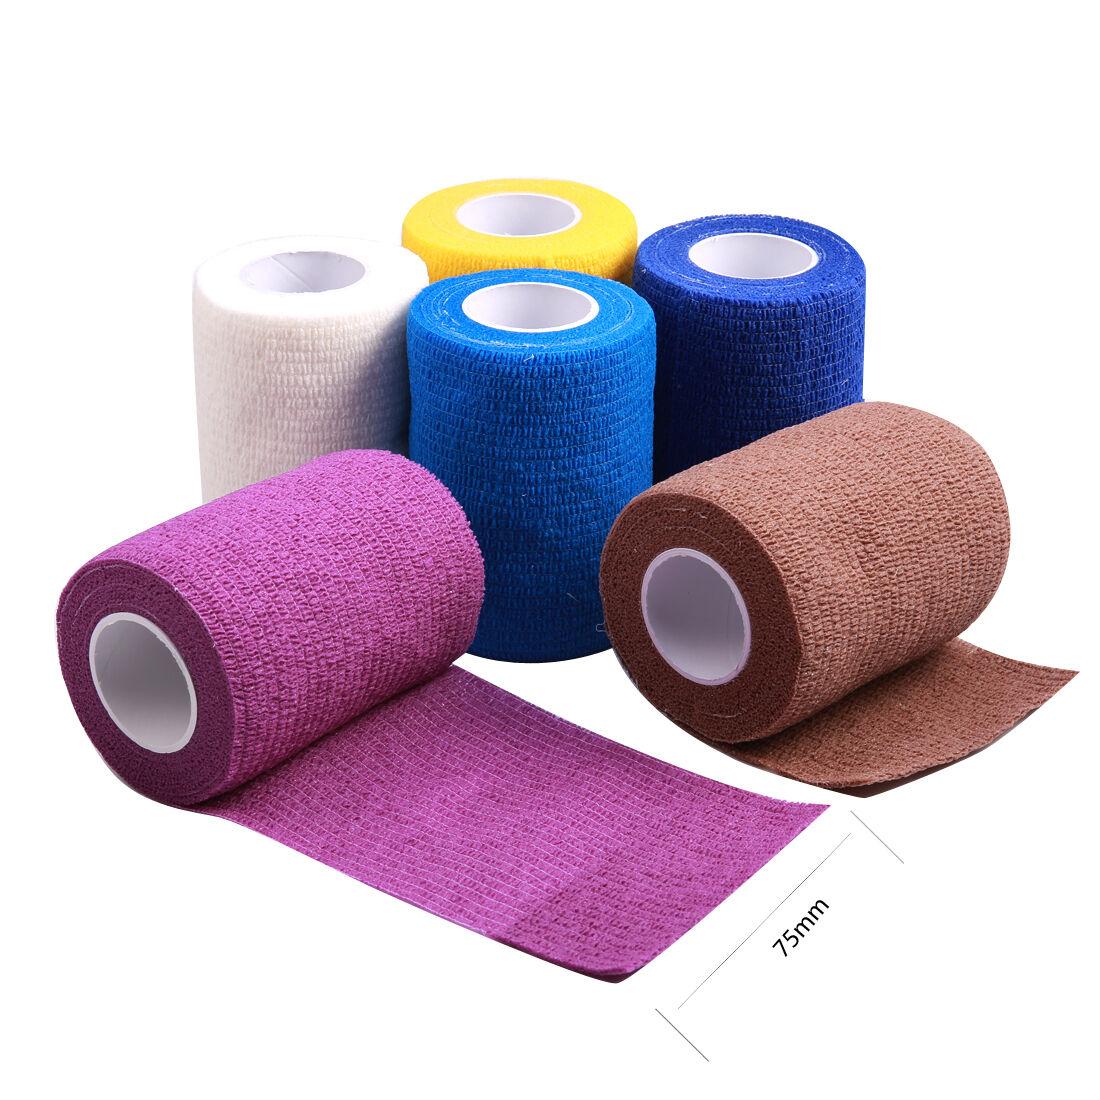 6pcs Self Adhesive Elastic Bandage Wrap First Aid Medical Gauze Random Color Ebay